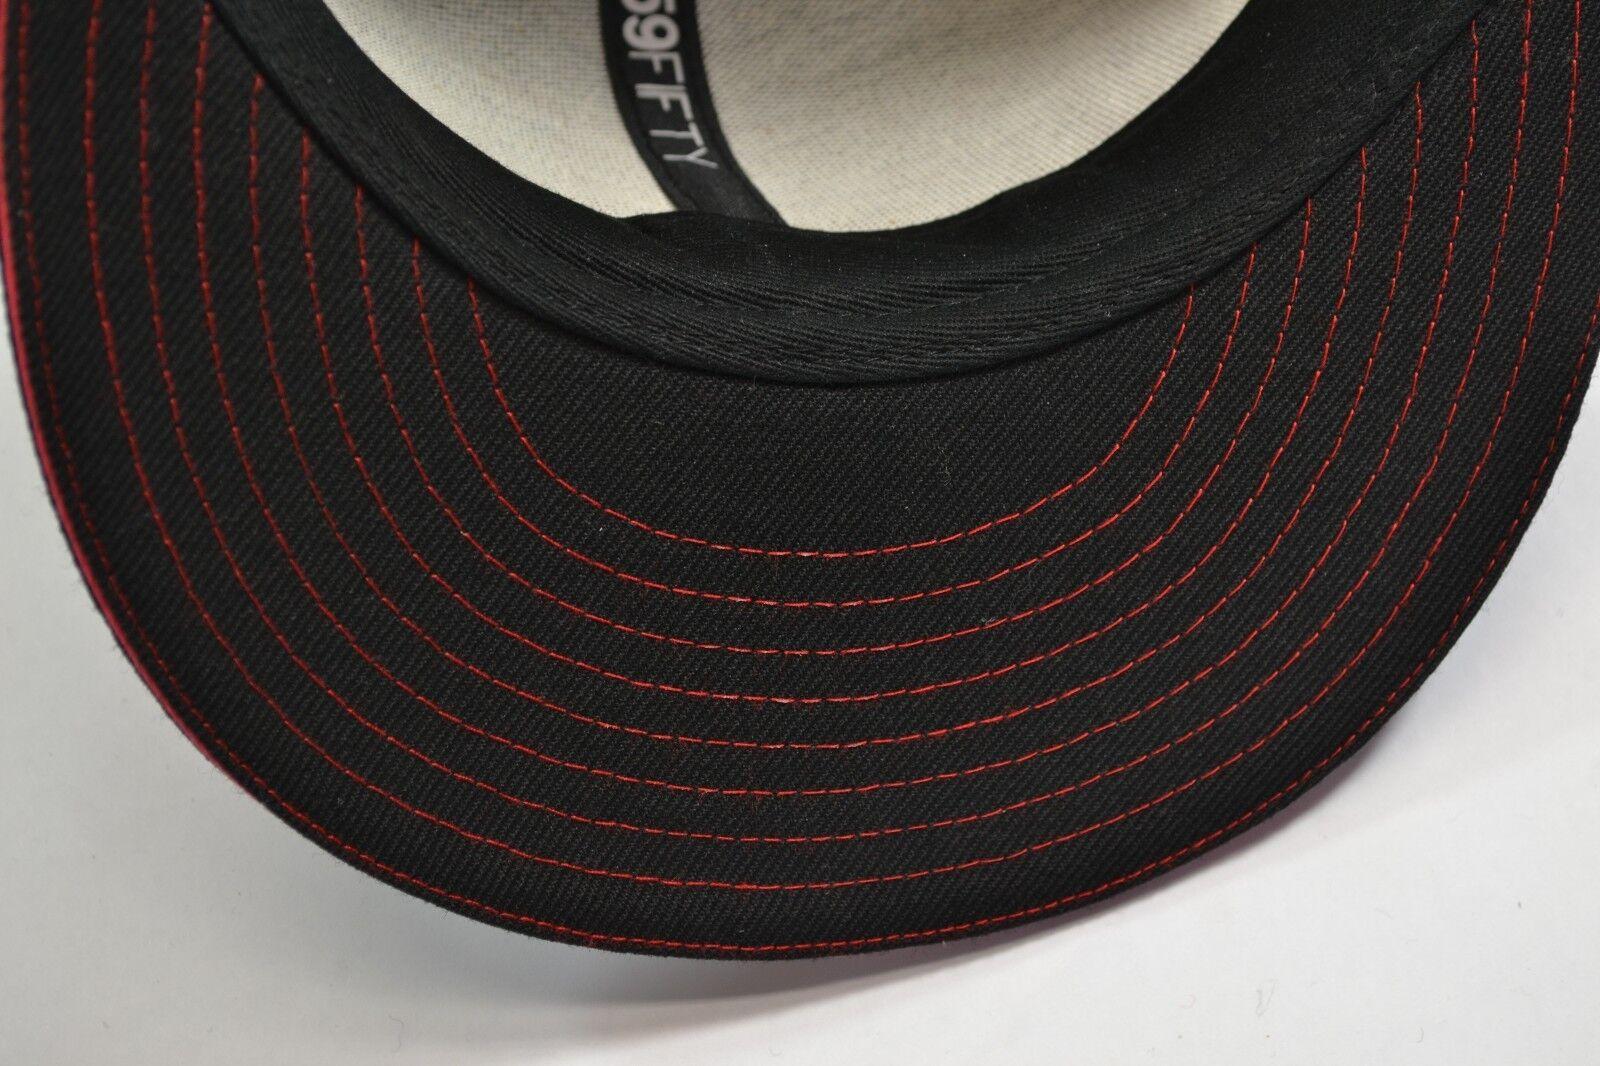 DC Shoes STREAKS Black Red White Men's Patch Logo Baseball Cap Discounted Men's White Hat 71c206